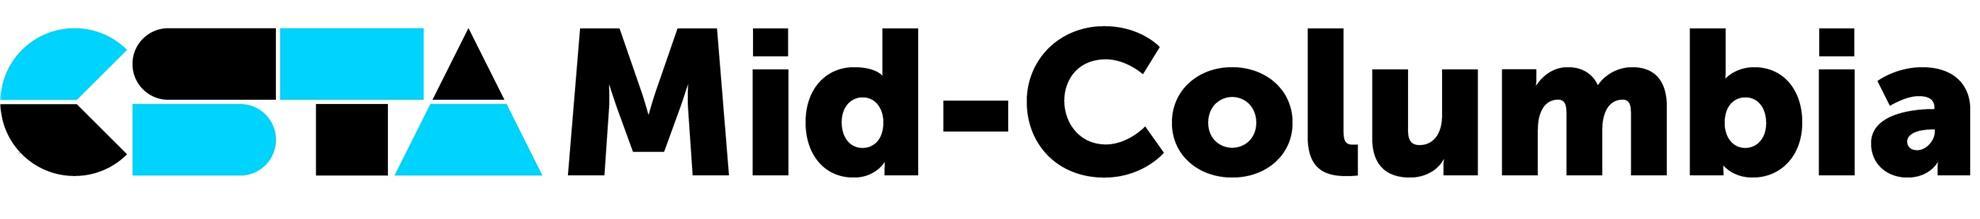 CSTA Mid-Columbia logo